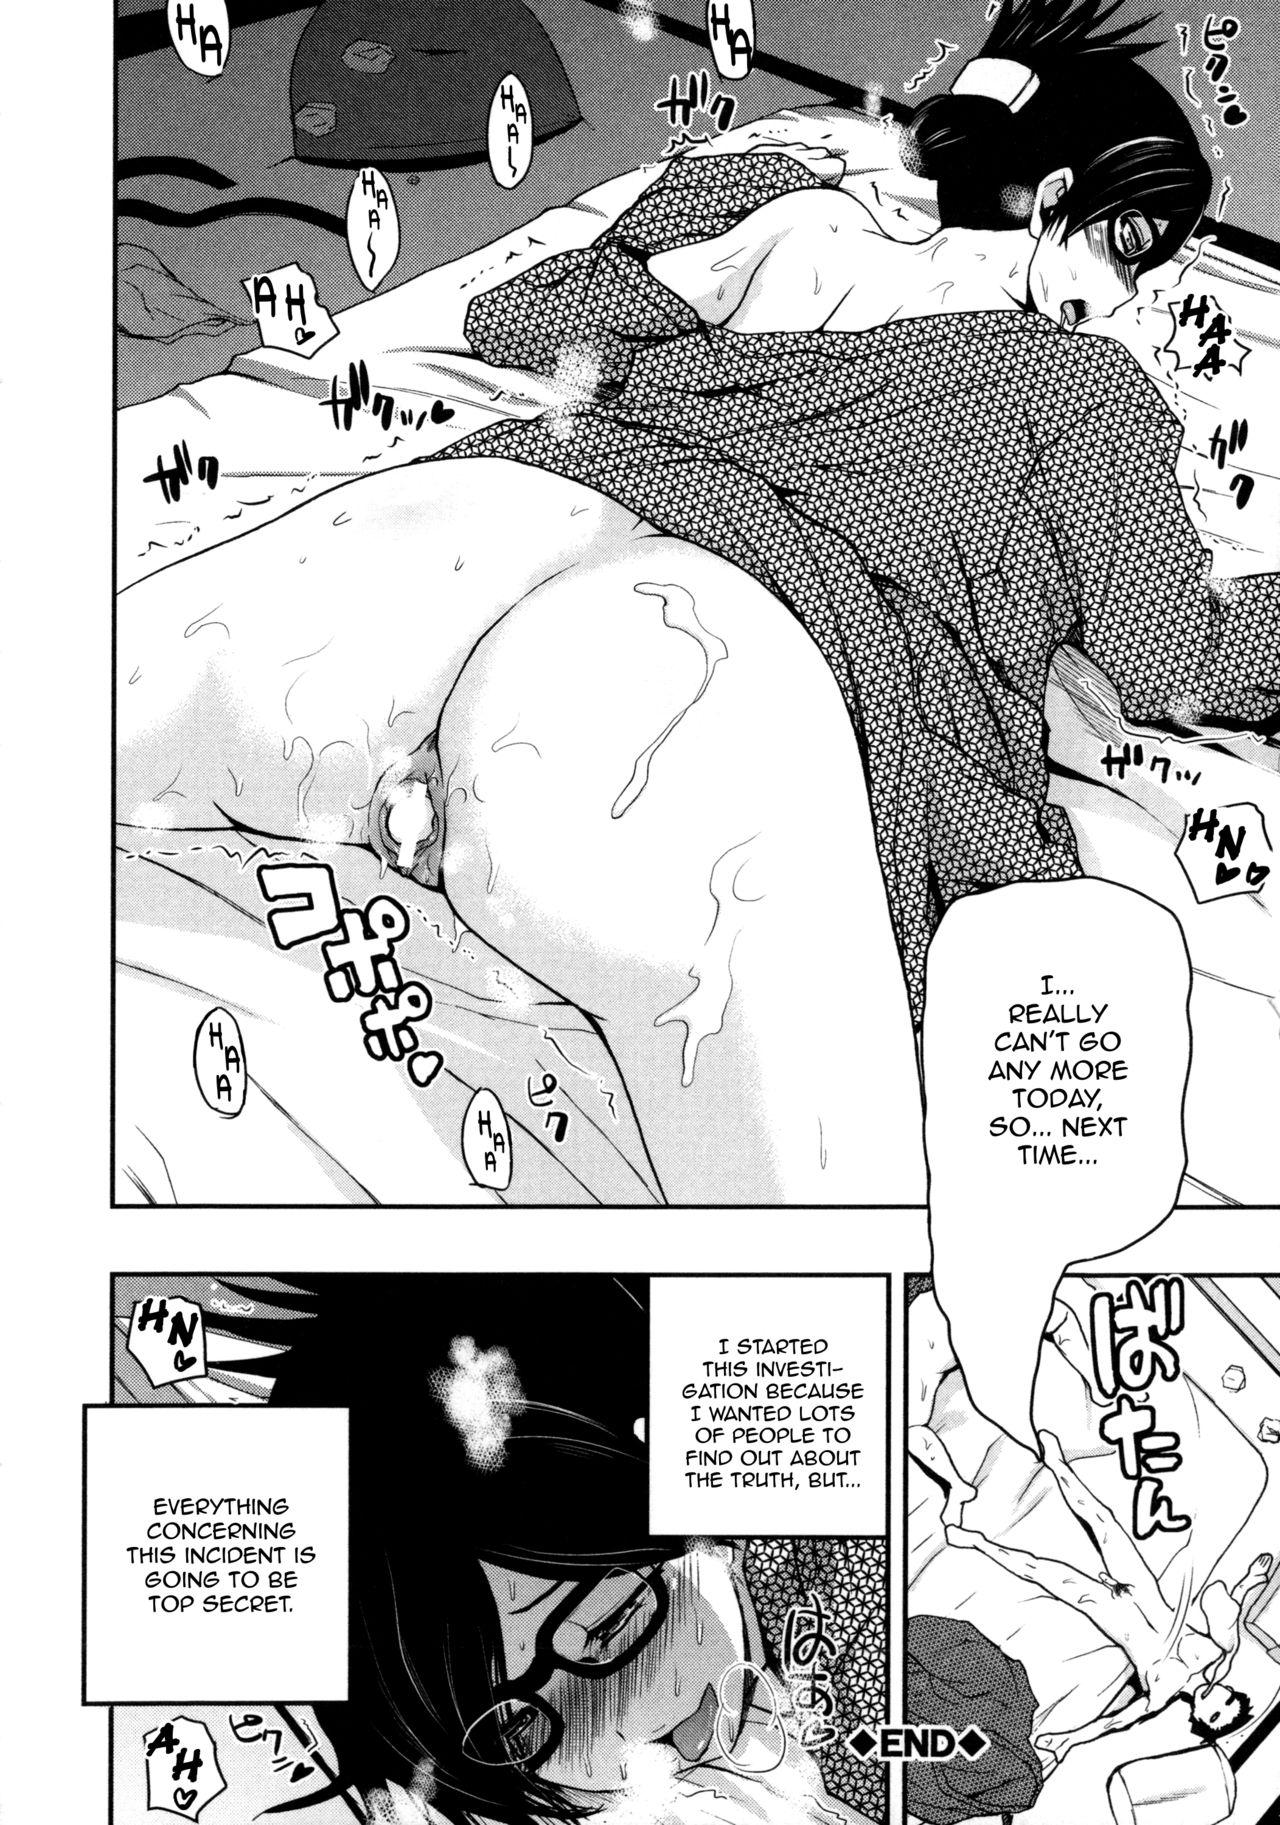 [Yoshimura Tatsumaki] Monzetsu Taigatame ~Count 3 de Ikasete Ageru~ | Faint in Agony Bodylock ~I'll make you cum on the count of 3~ [English] [Brolen] 229